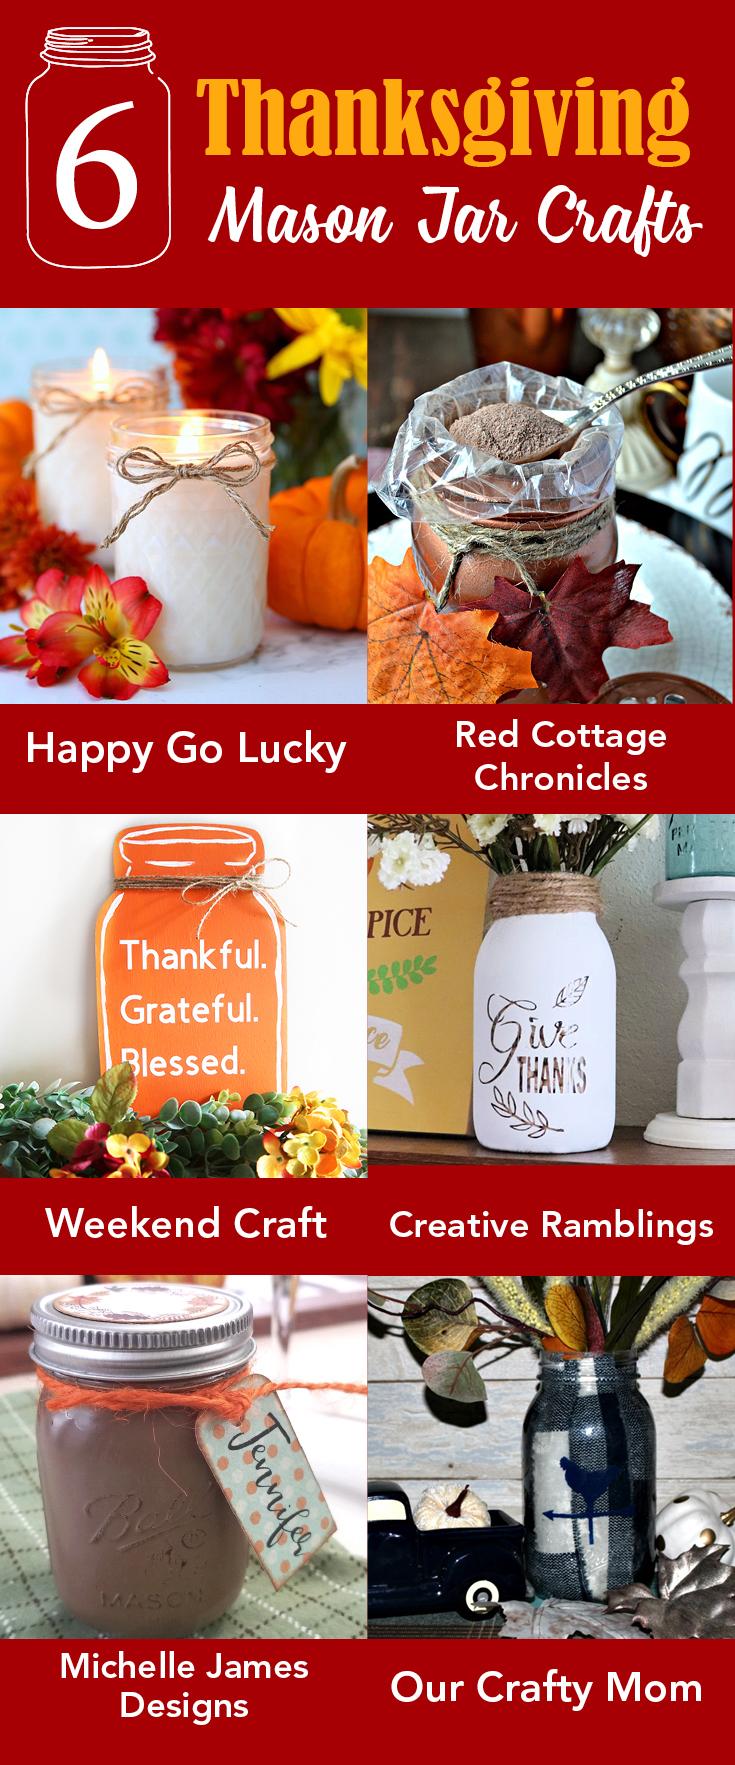 6-Thanksgiving-Mason-jar-crafts.jpg